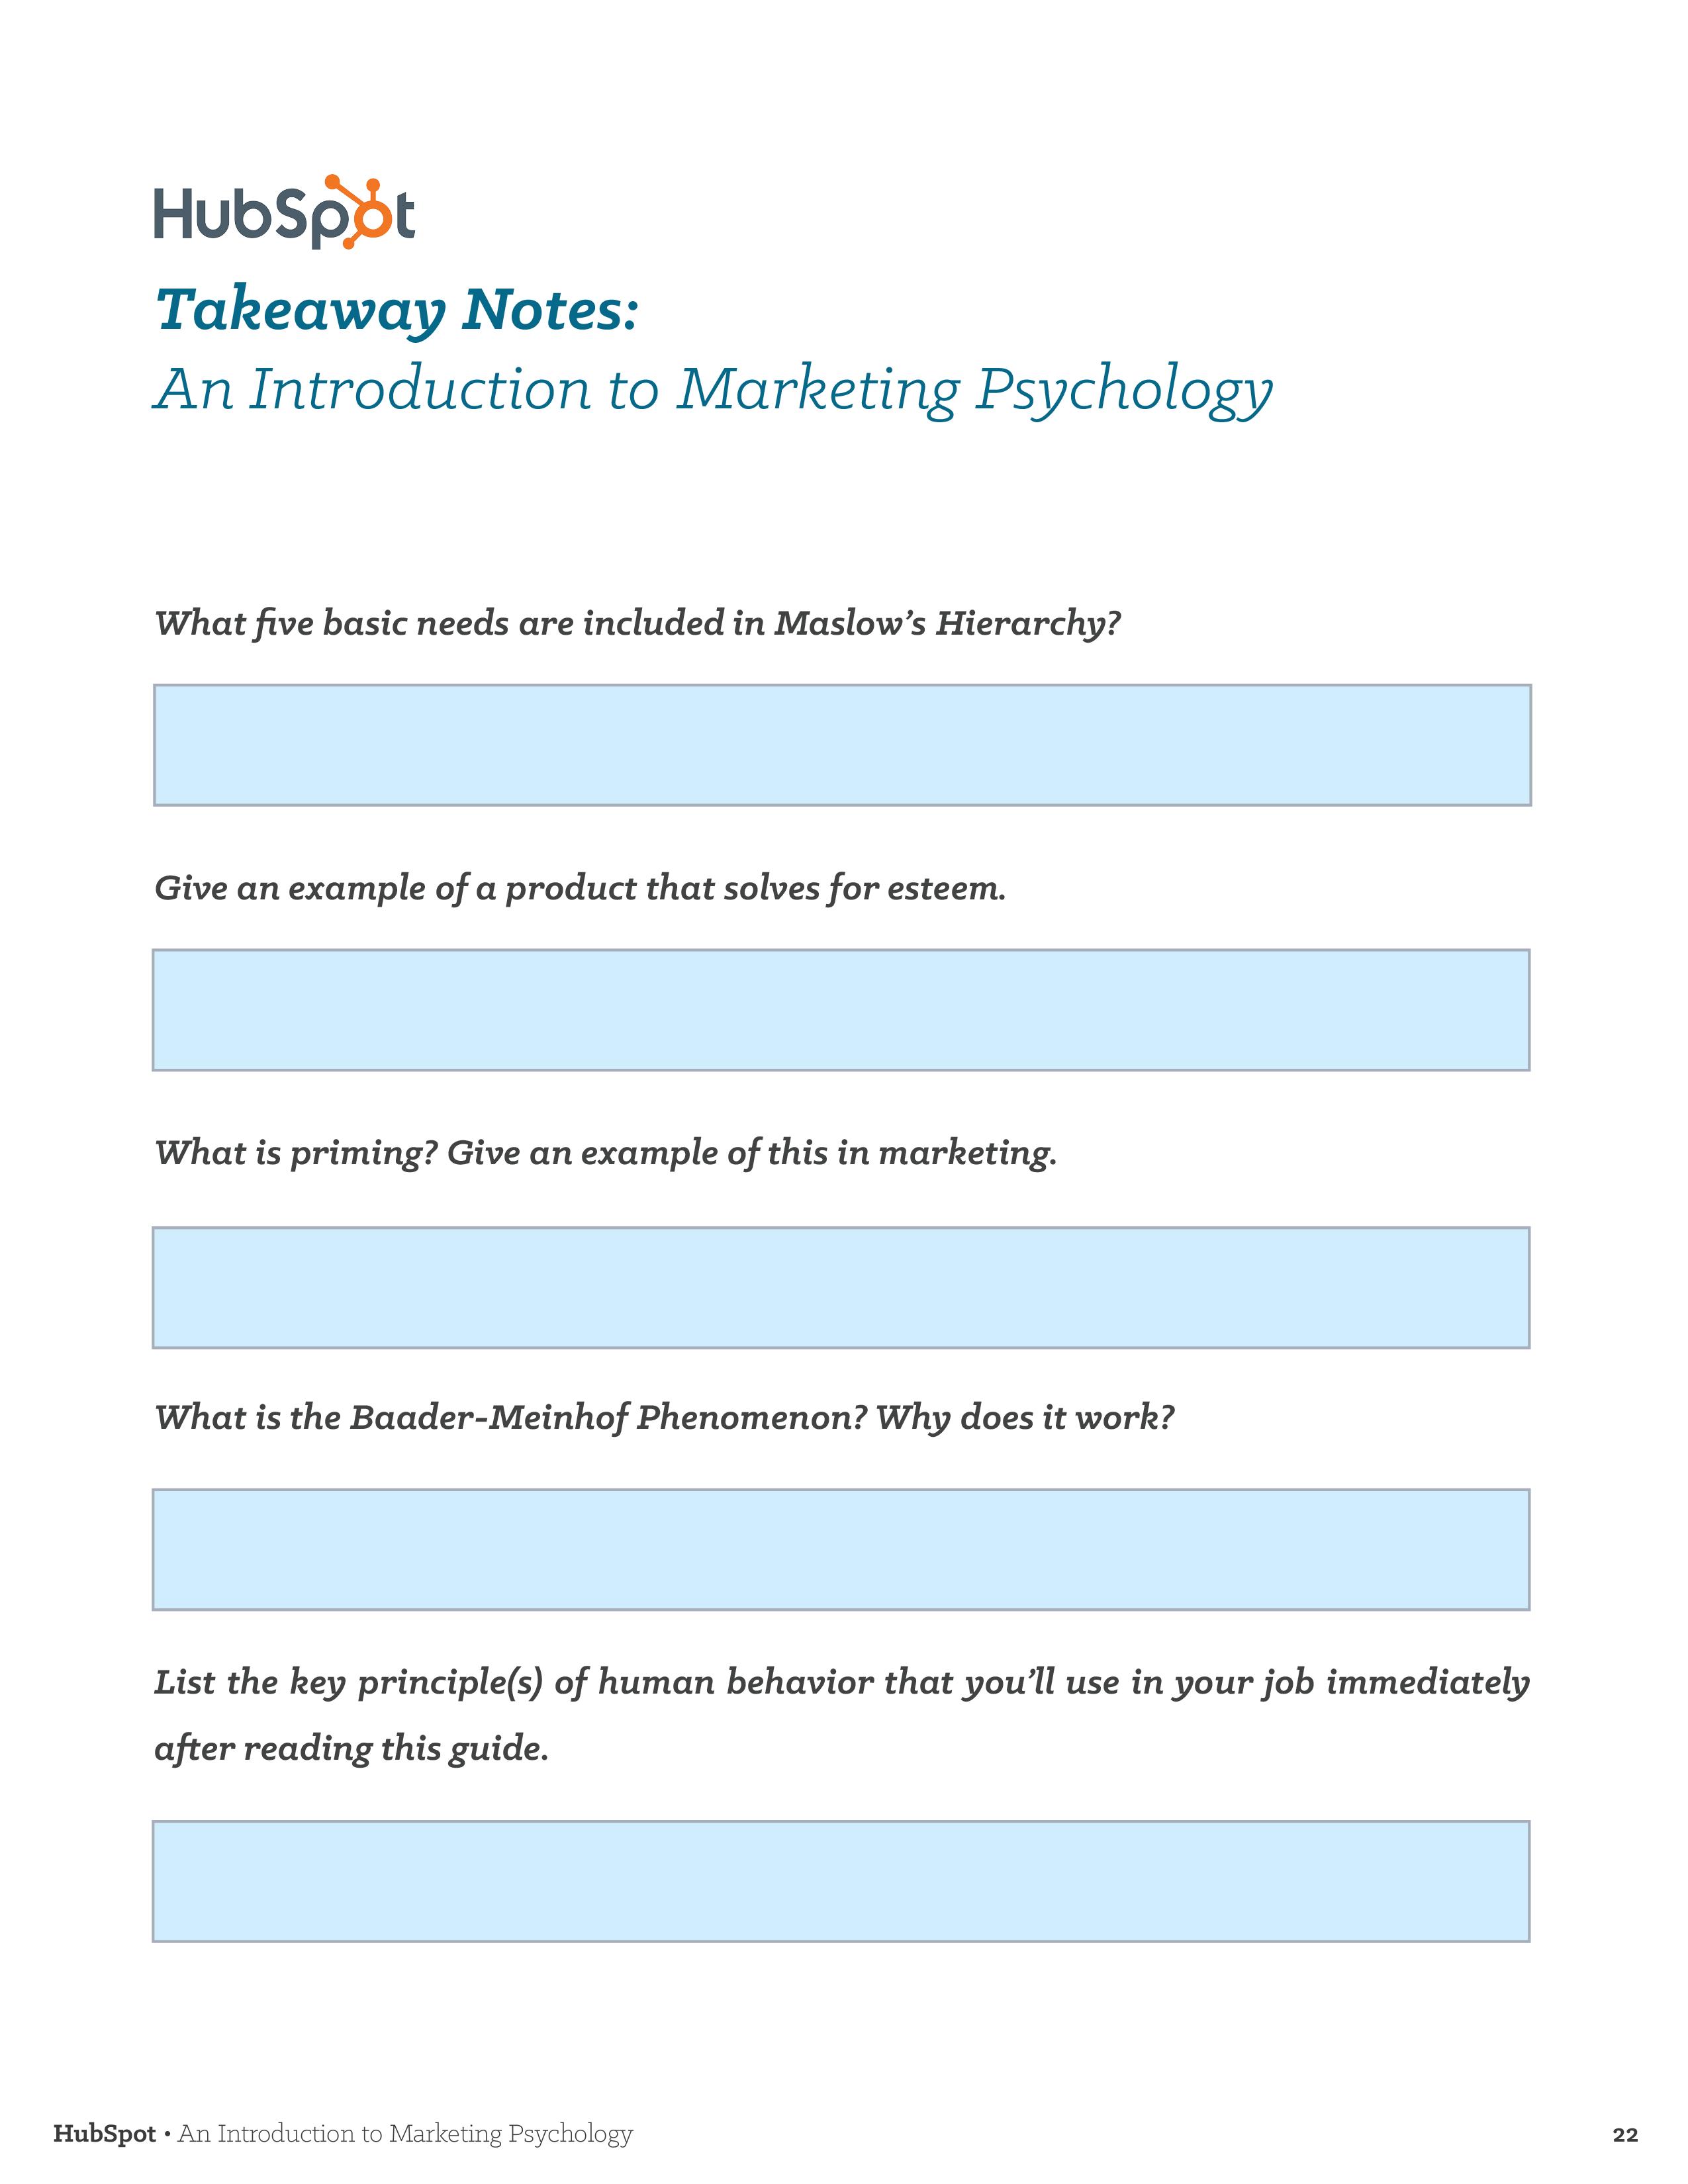 Marketing_Psychology22.png